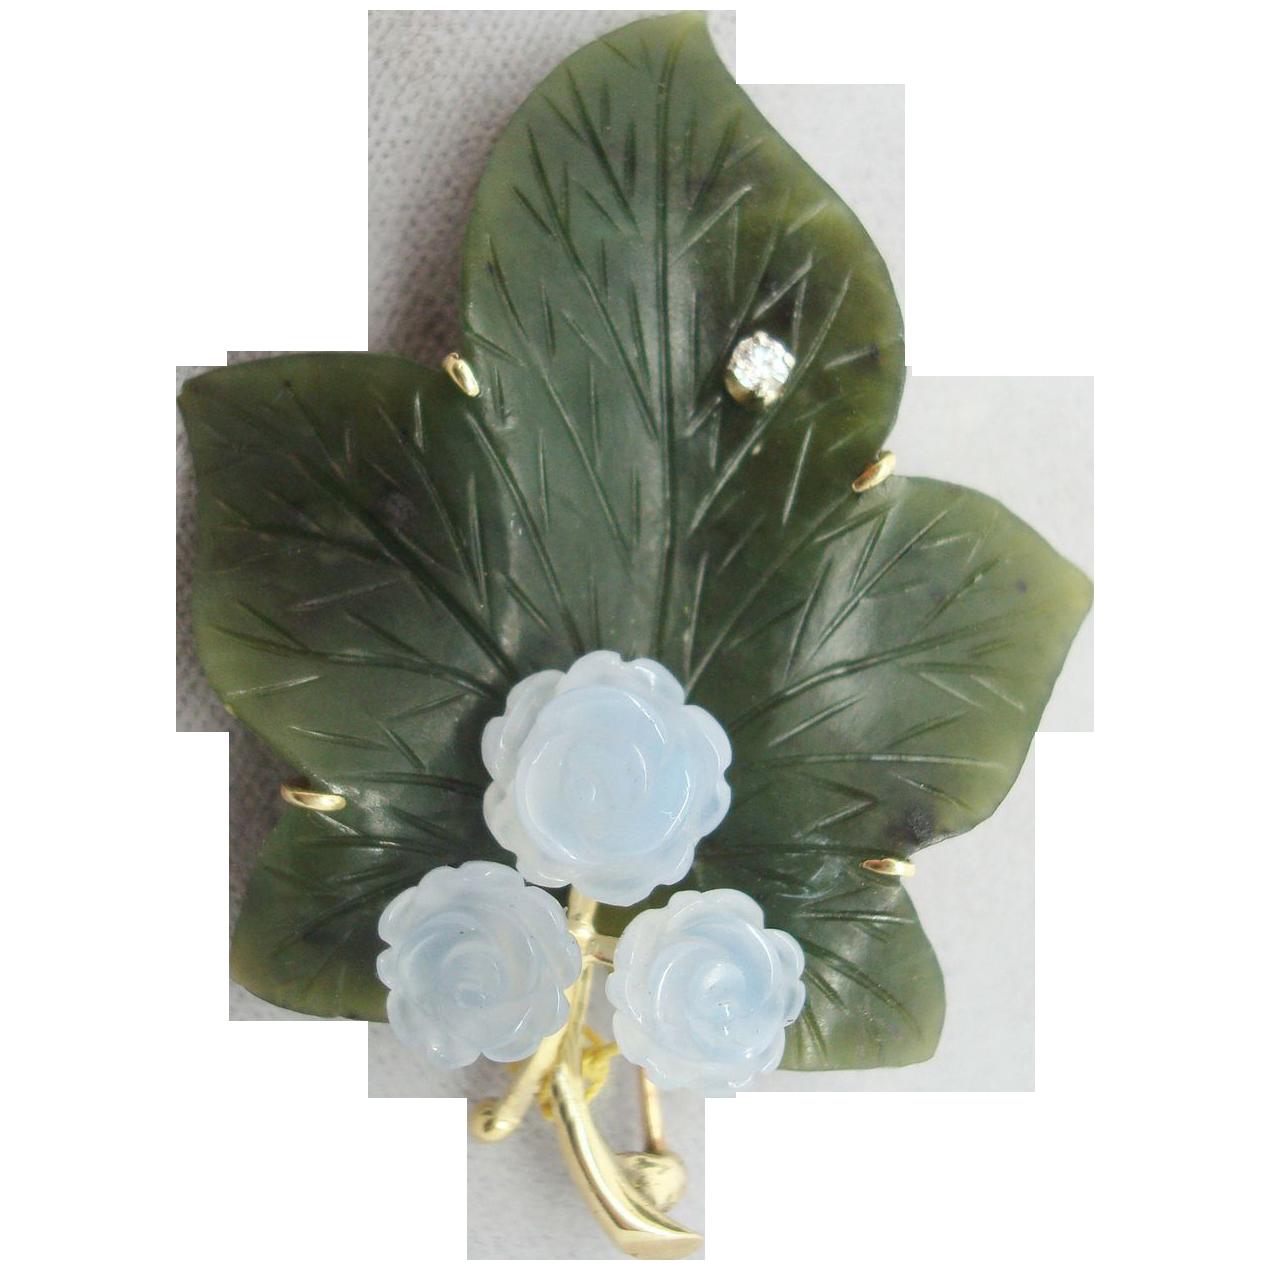 14 Karat Jade Leaf Brooch with Blue Chalcedony Flowers